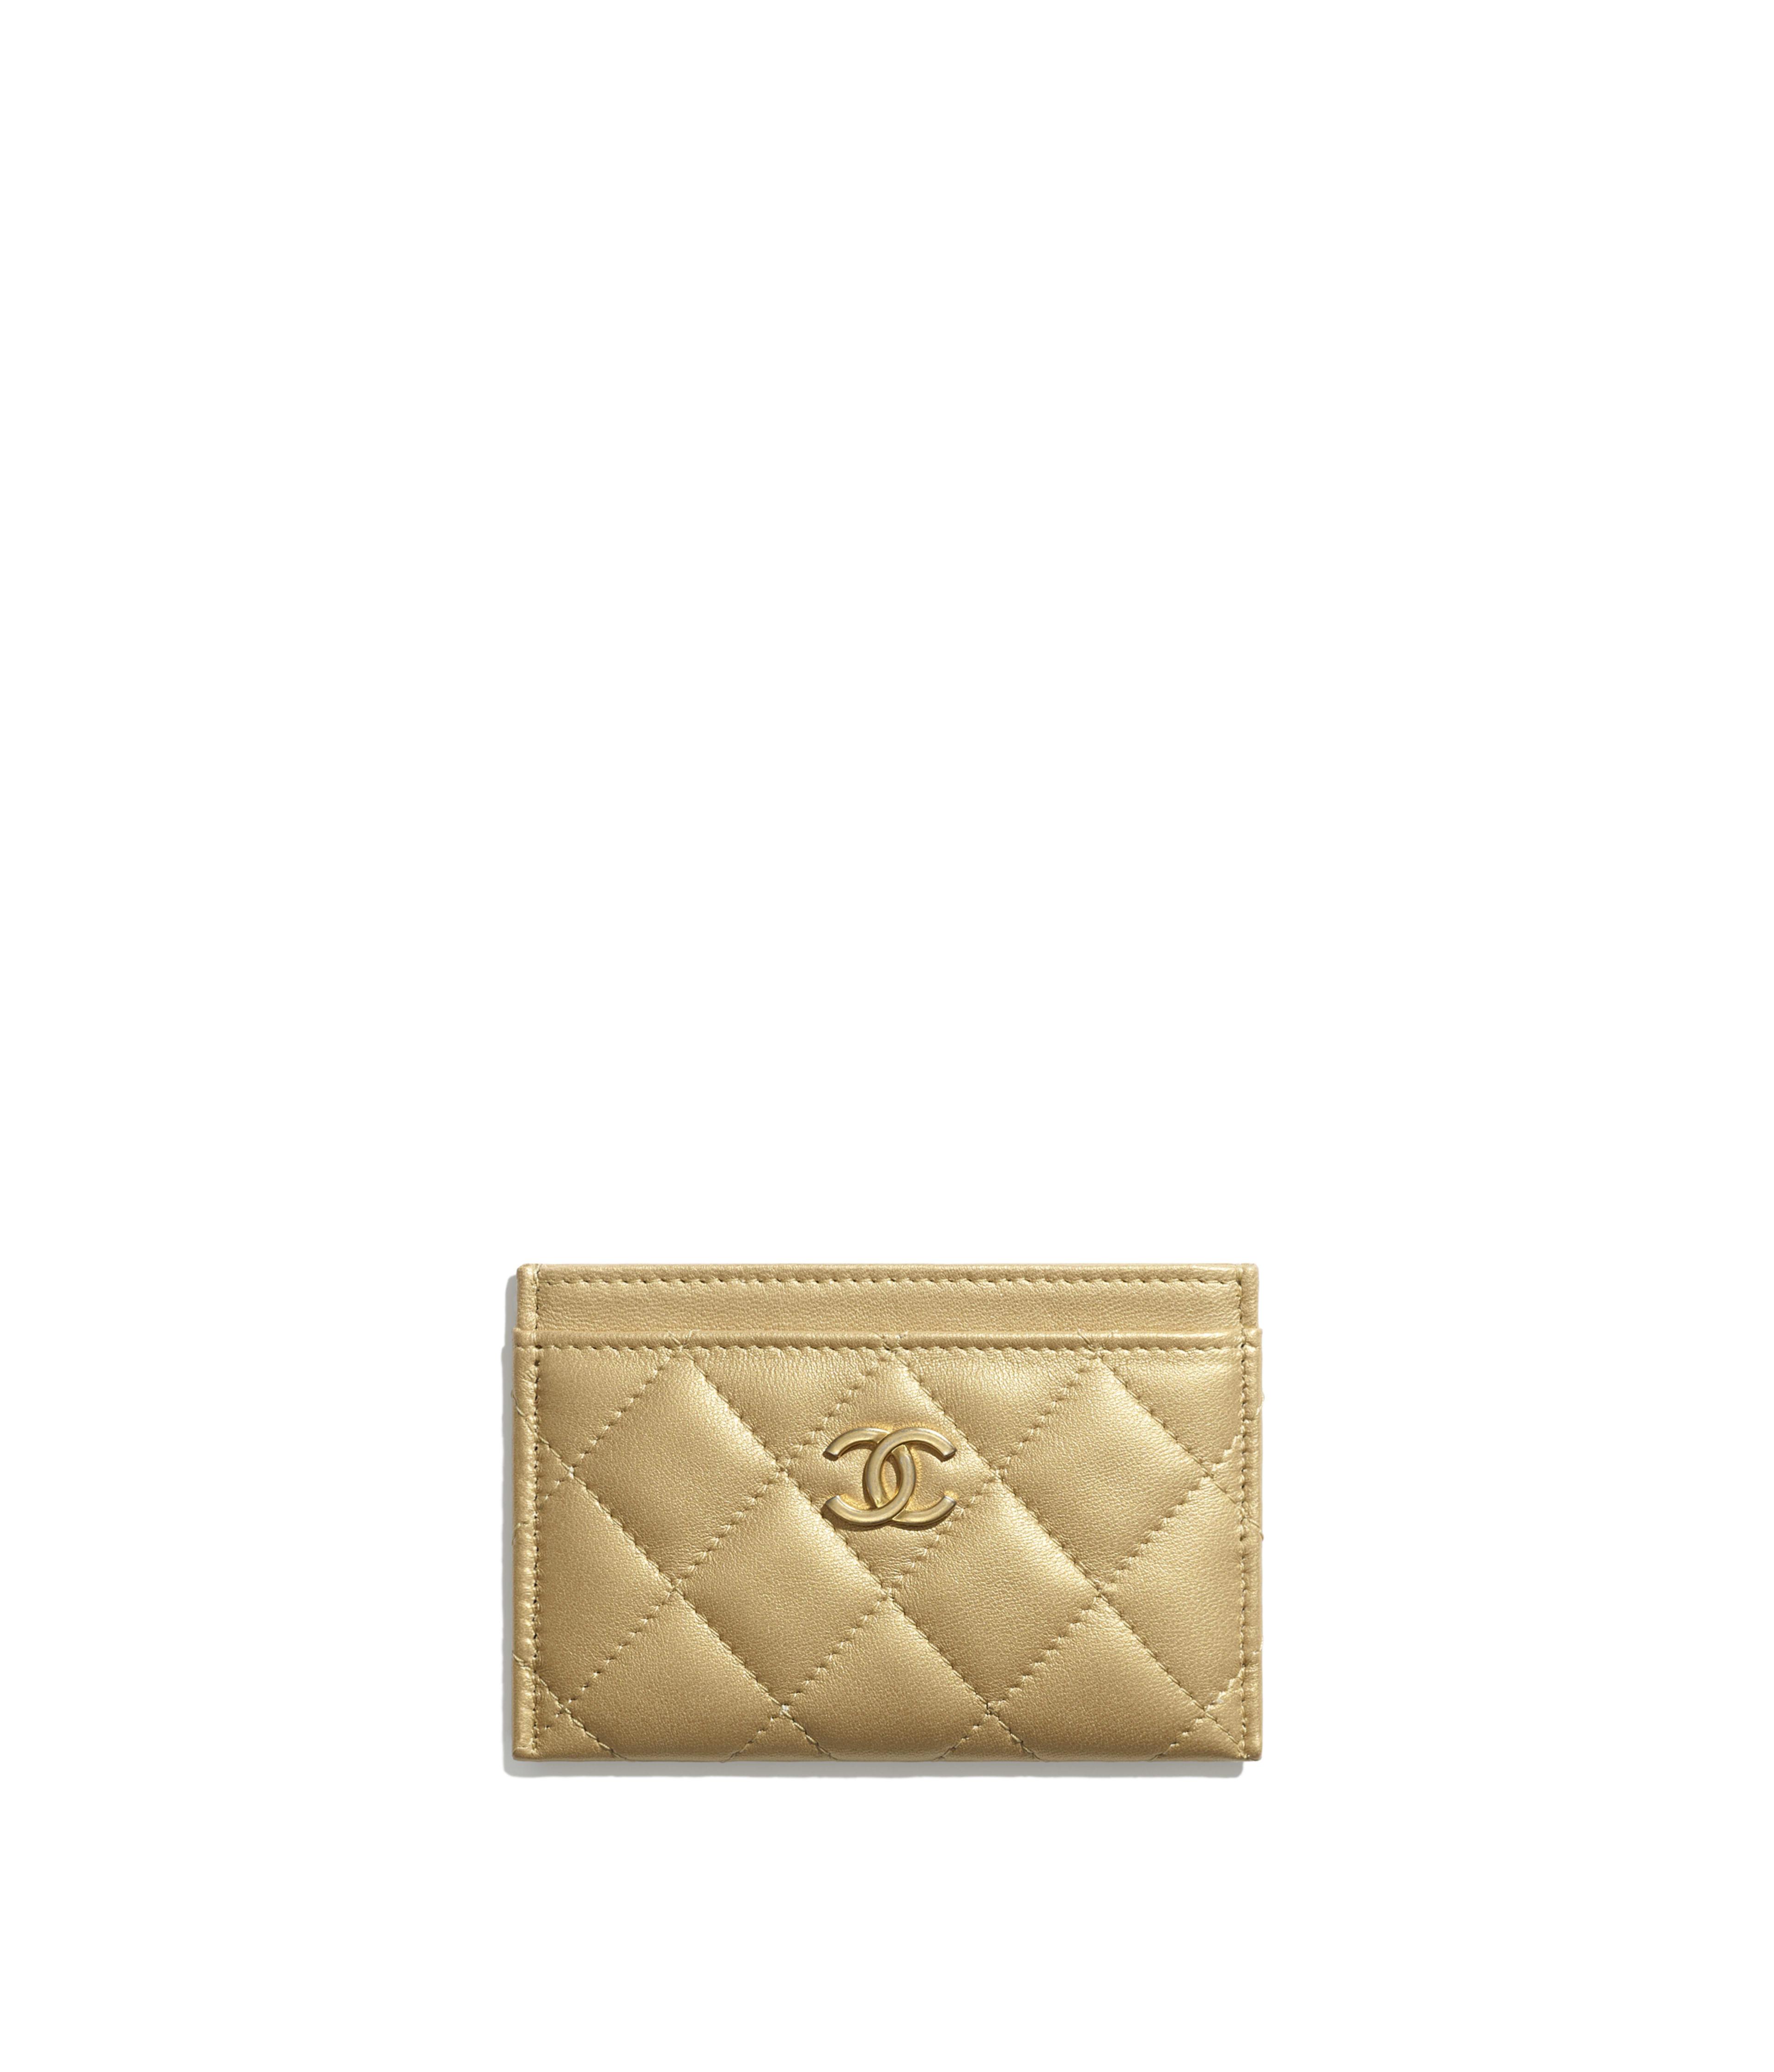 bced26afdb54 Card Holder Metallic Lambskin & Gold-Tone Metal, Gold Ref. AP0034B00881N4806